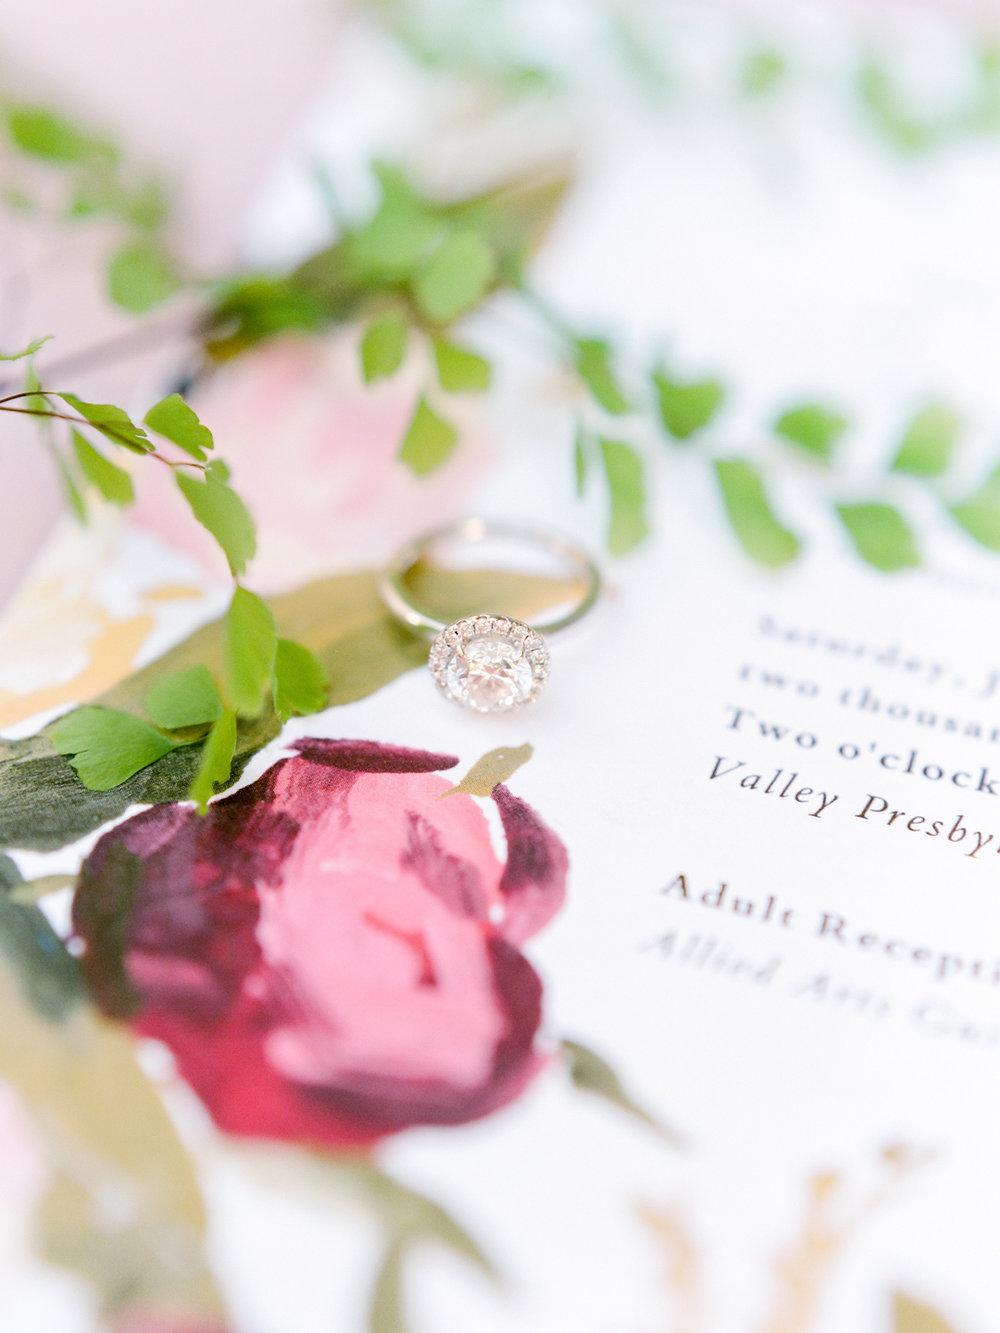 Clare & Samuel's Summer Garden Wedding at Allied Arts Guild  Natalie Choi Events. Kate Anfinson Photography. My Wedding Sense.